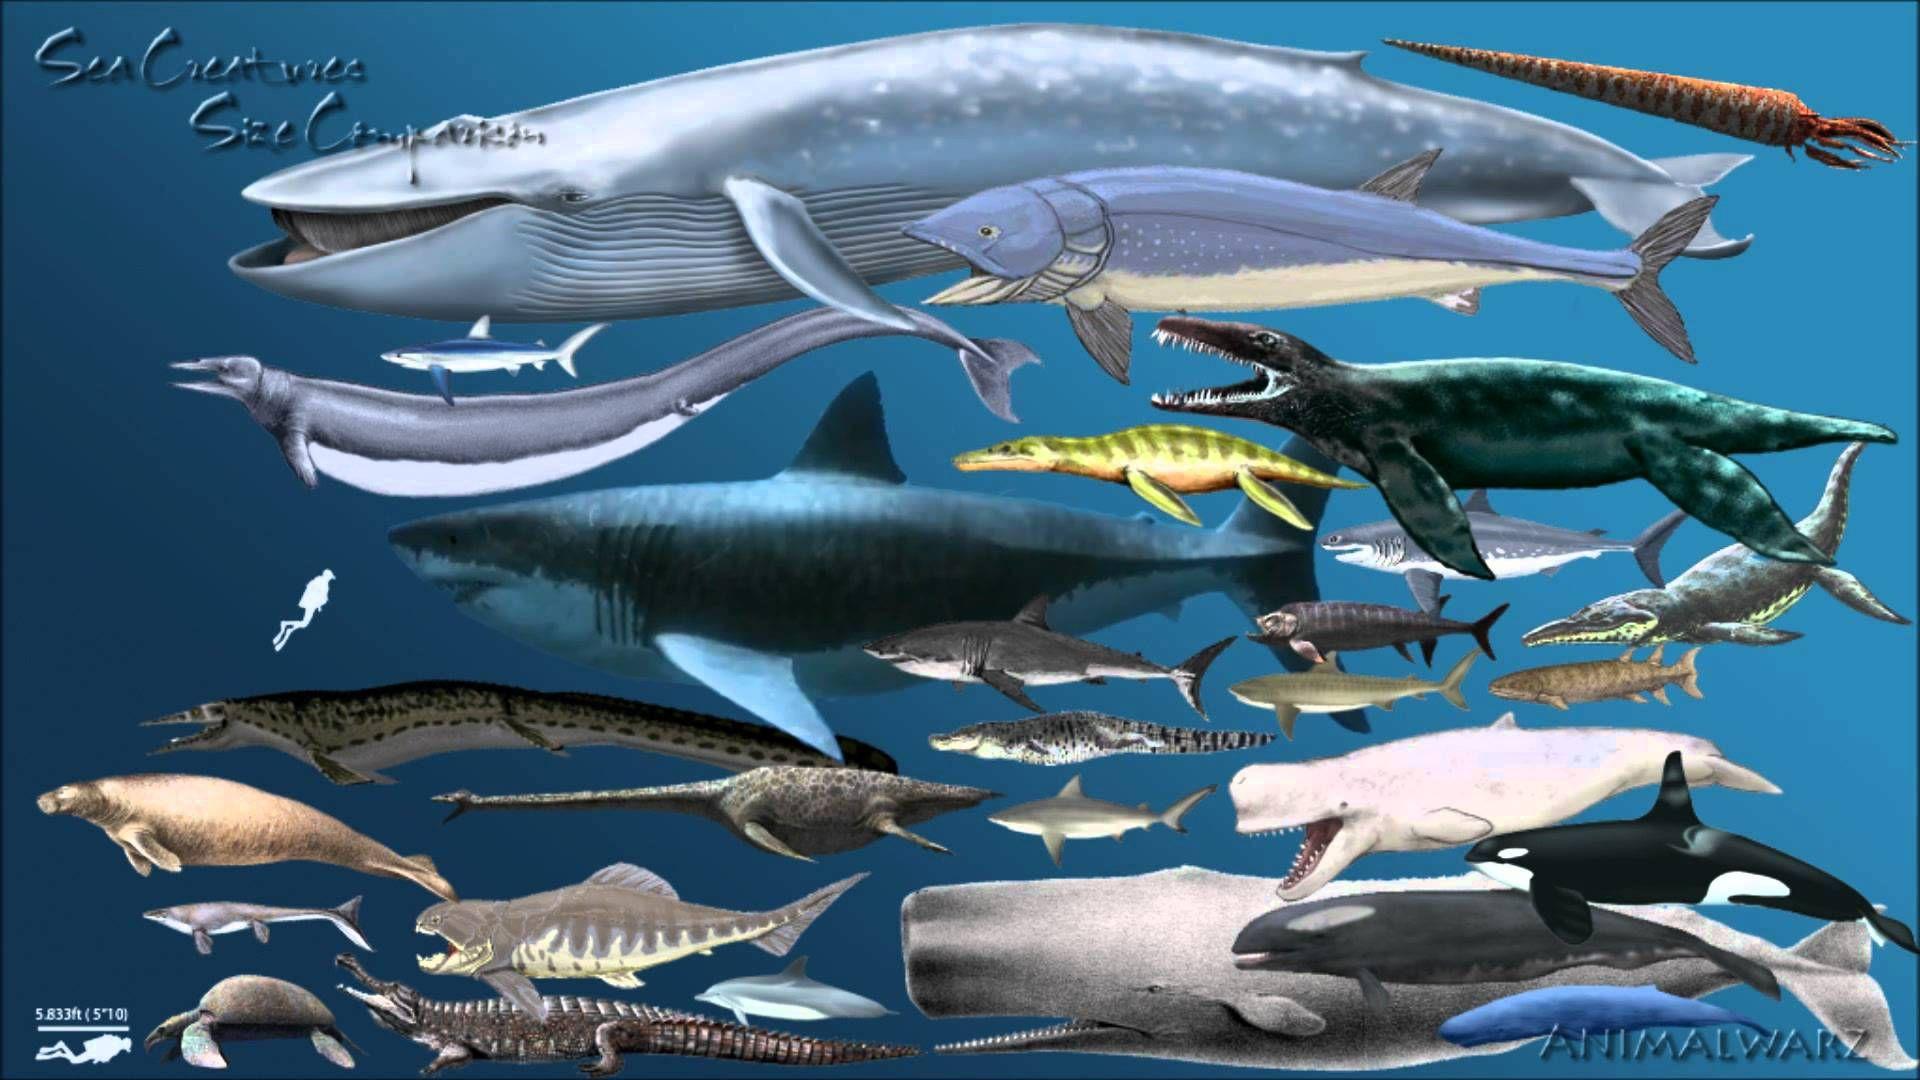 blue whale size - HD1920×1080